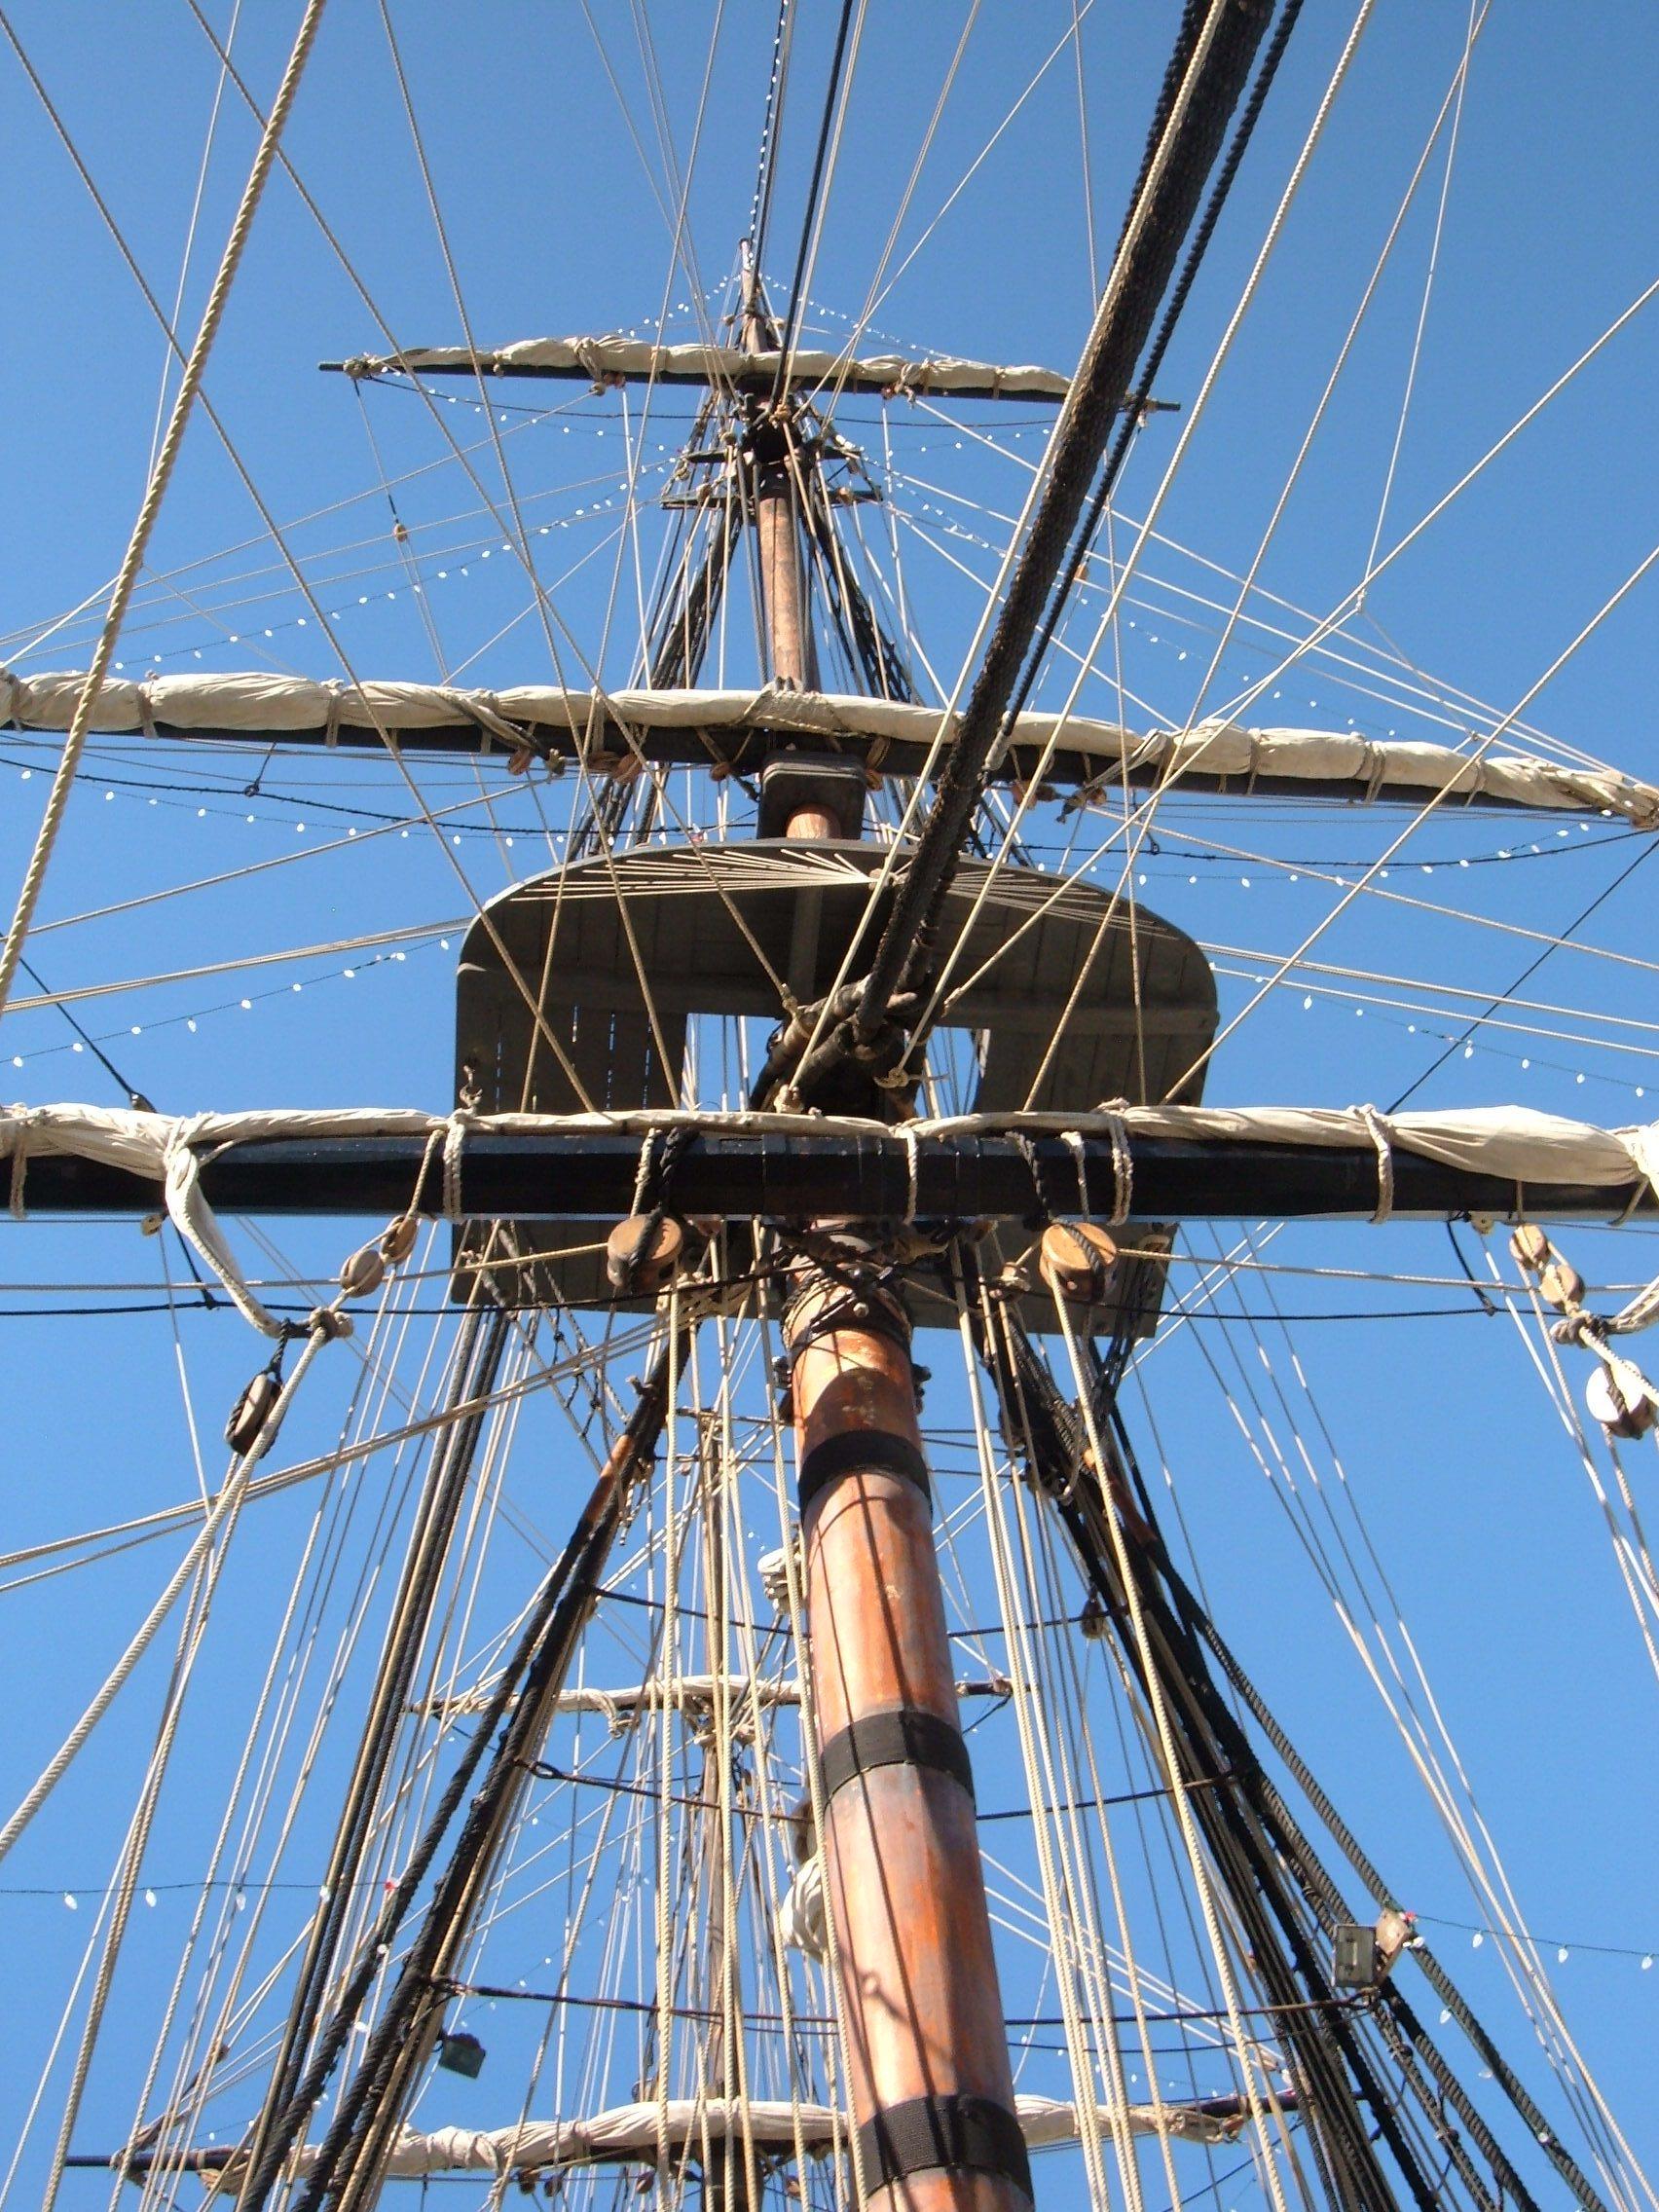 Filehms surprise replica ship mast 3g wikimedia commons filehms surprise replica ship mast 3g sciox Gallery